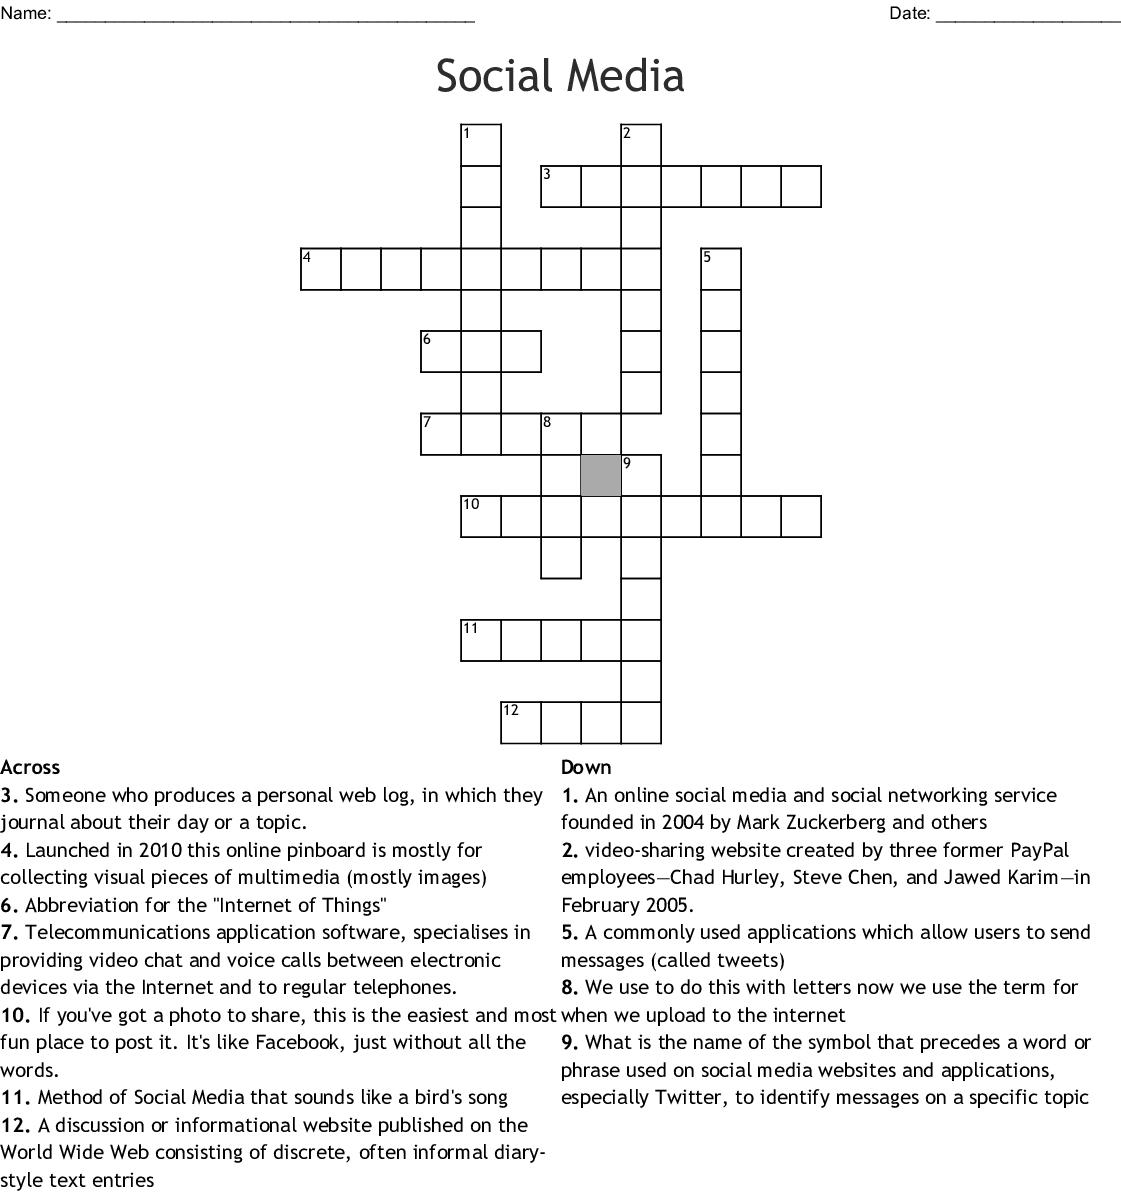 Social Media Crossword - WordMint